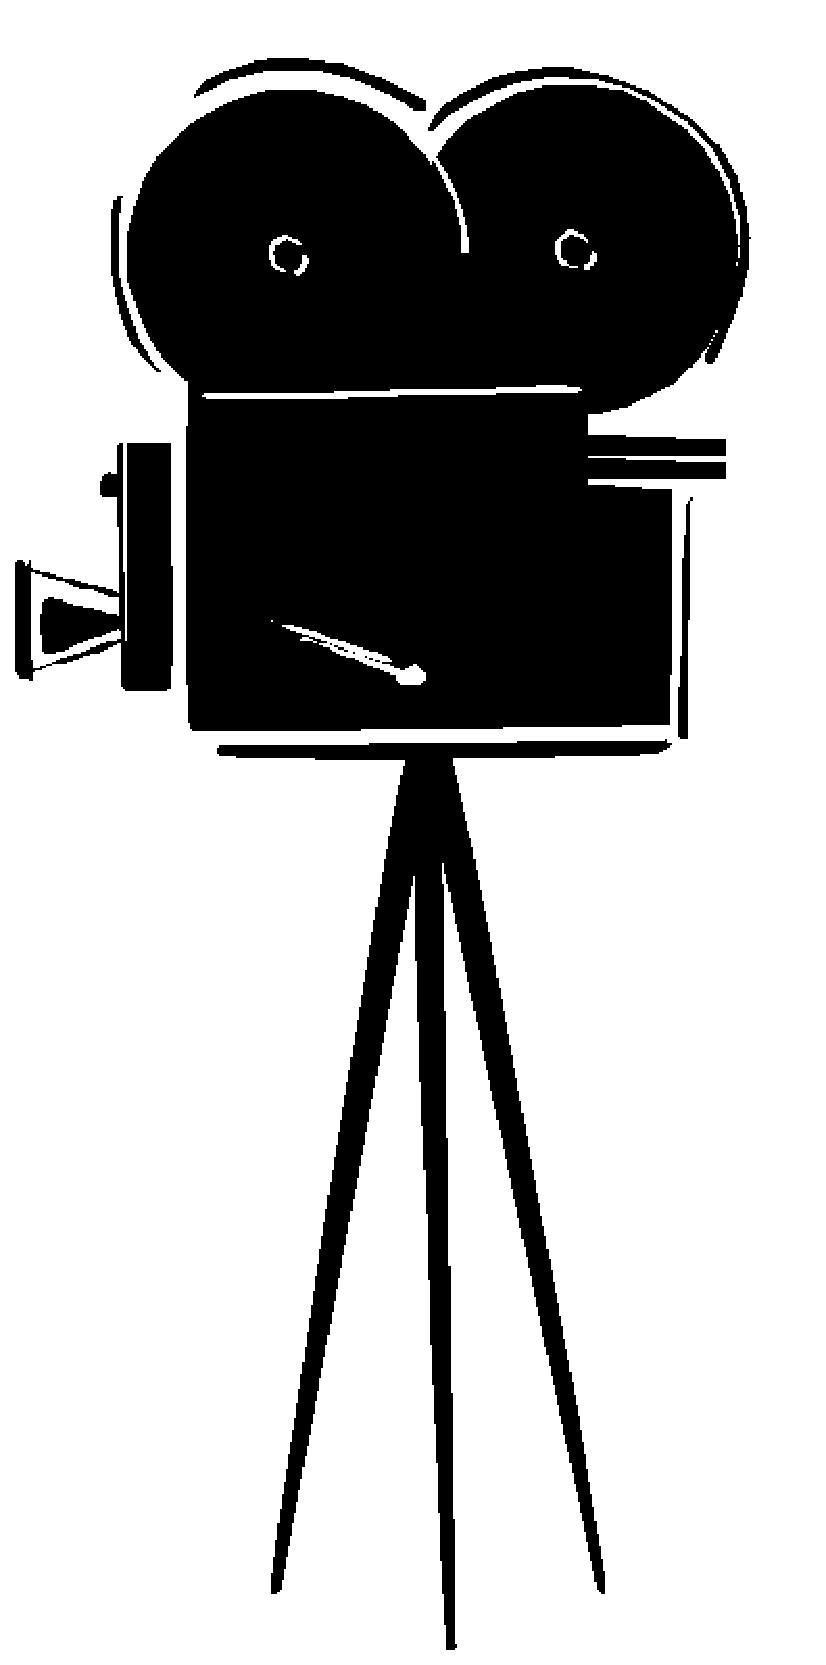 Movie projector clipart free clipart ima-Movie projector clipart free clipart images 2-11